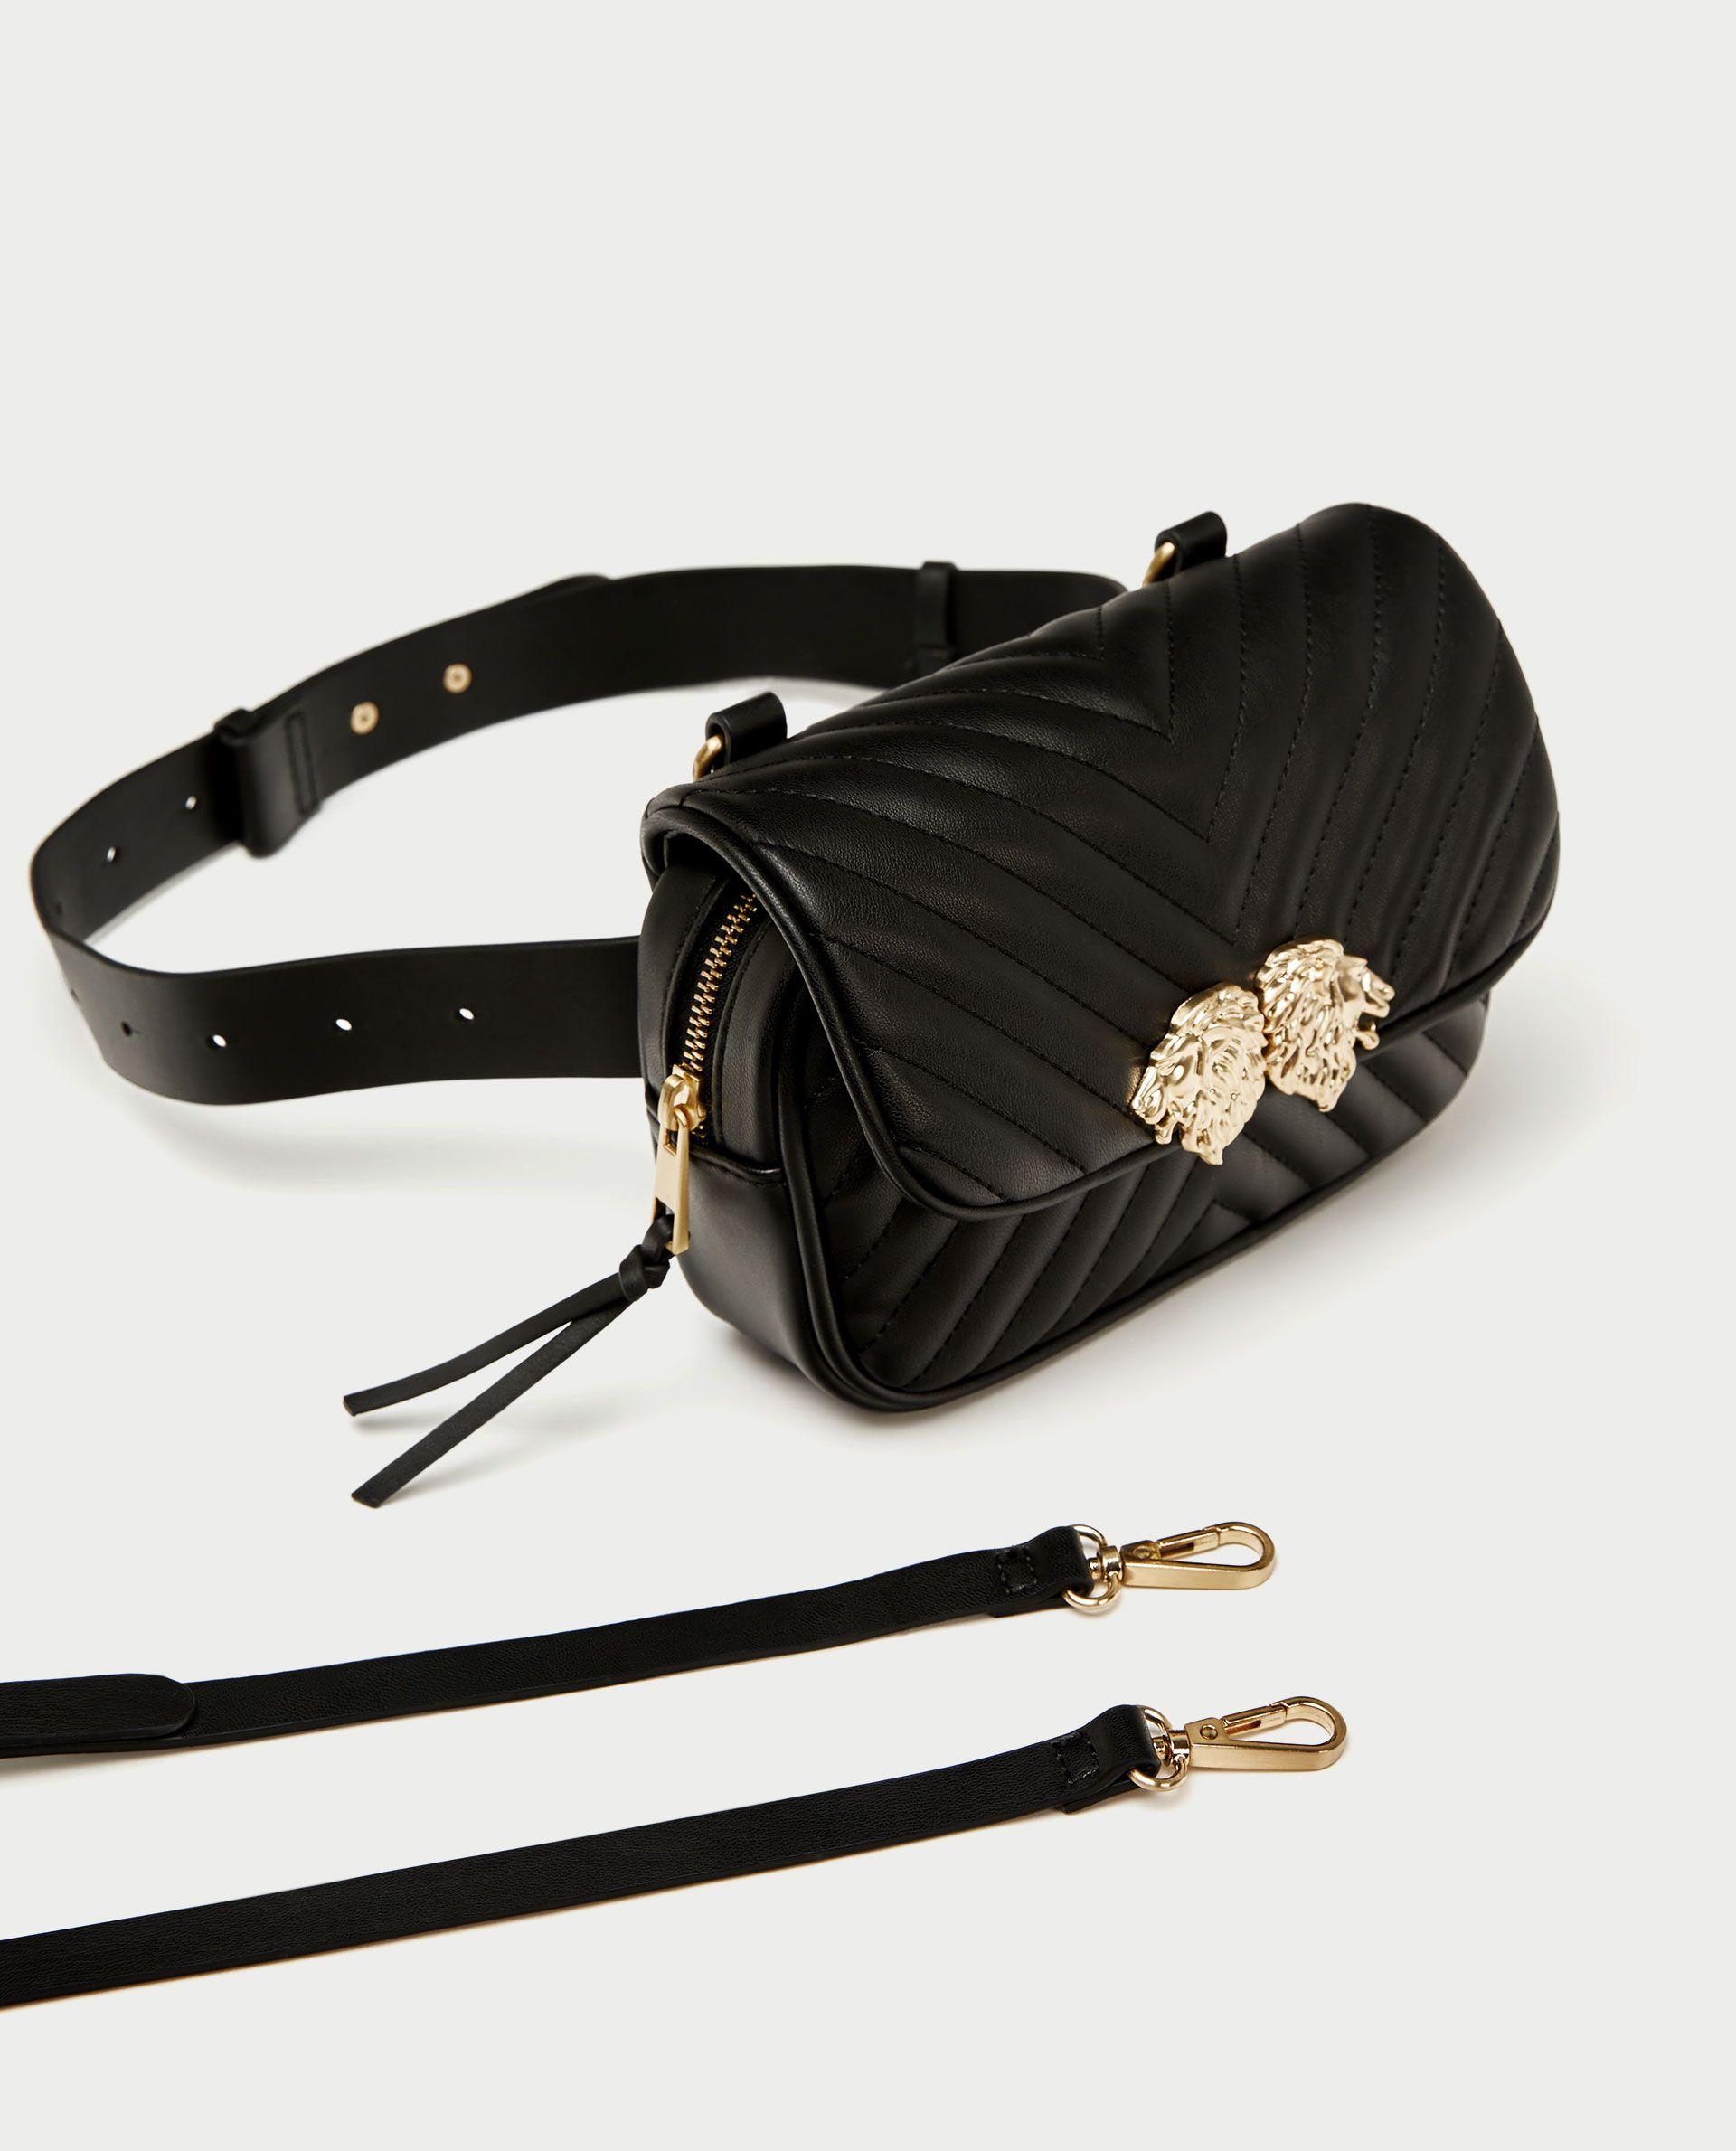 89628f1de3c221 Crossbody belt bag with lionhead detail | + wishlist | Crossbody bag ...